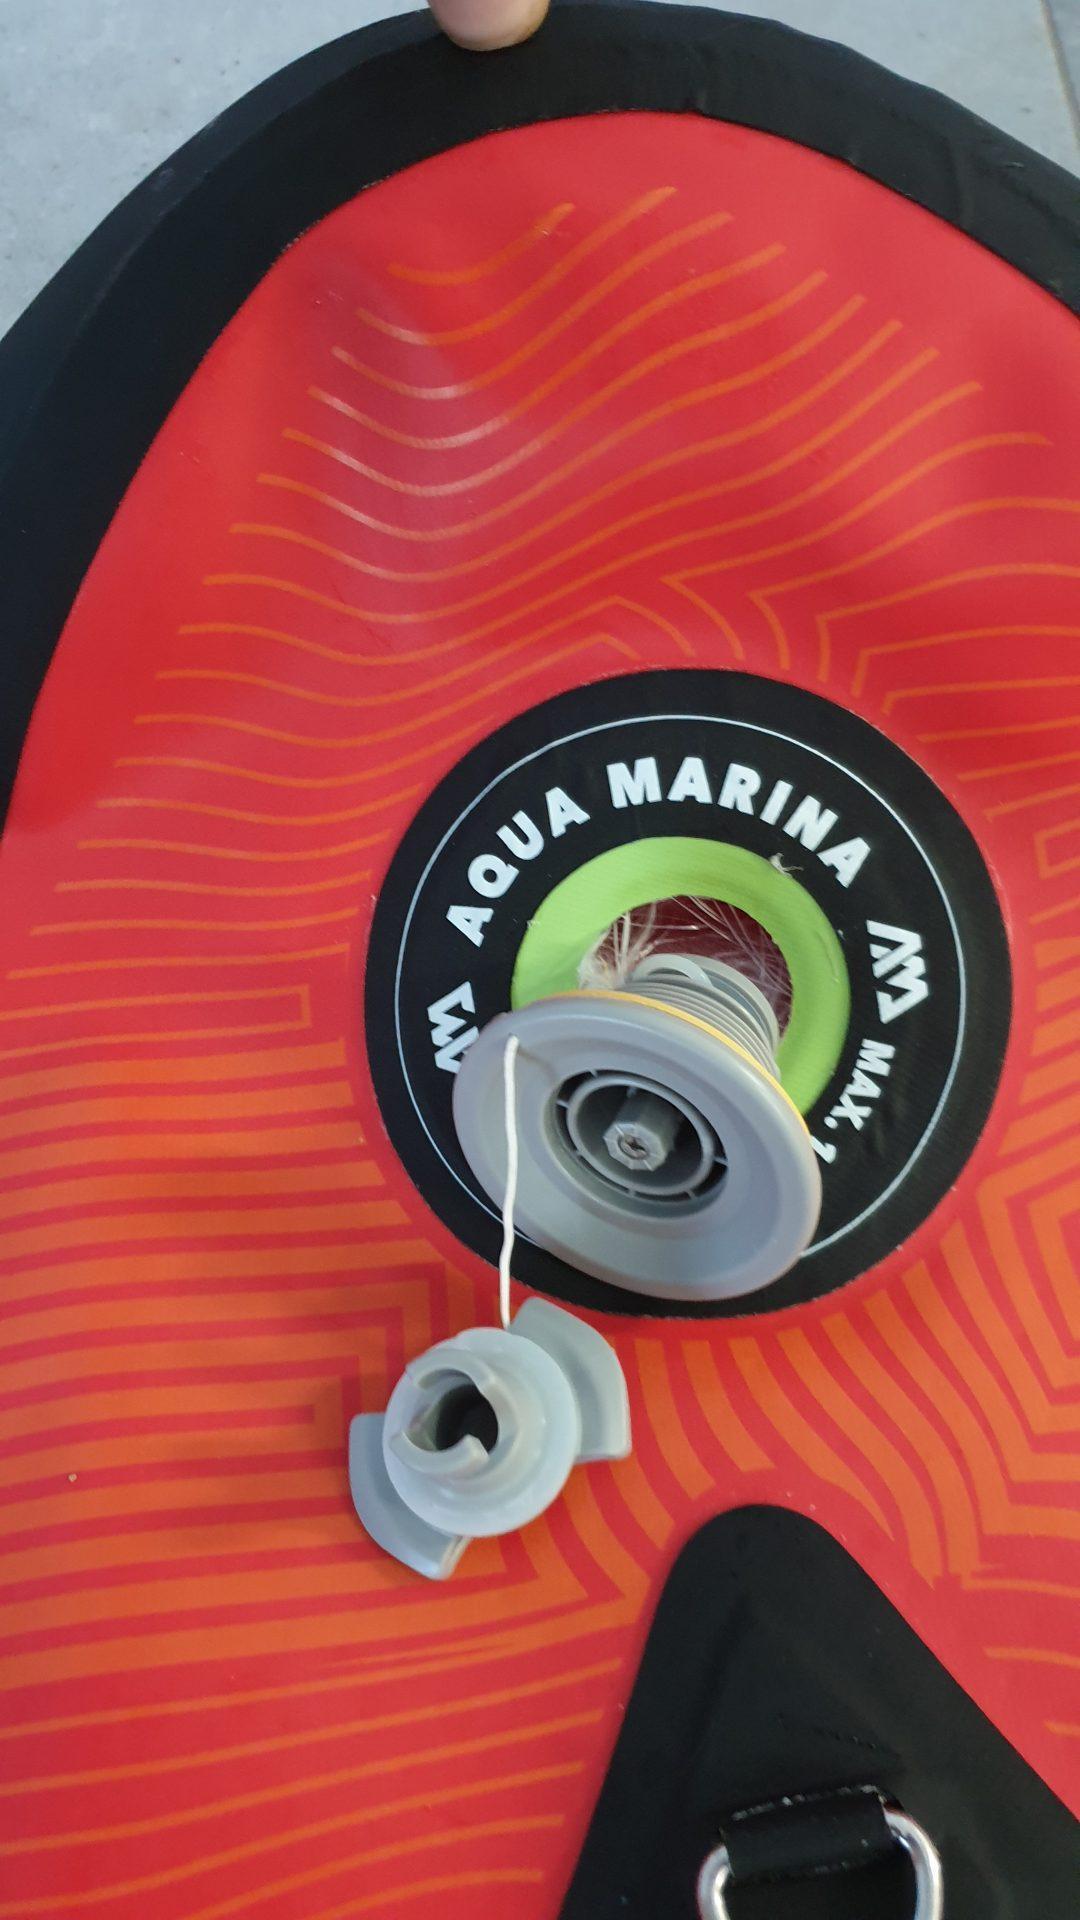 Zamenjava ventila AquaMarina